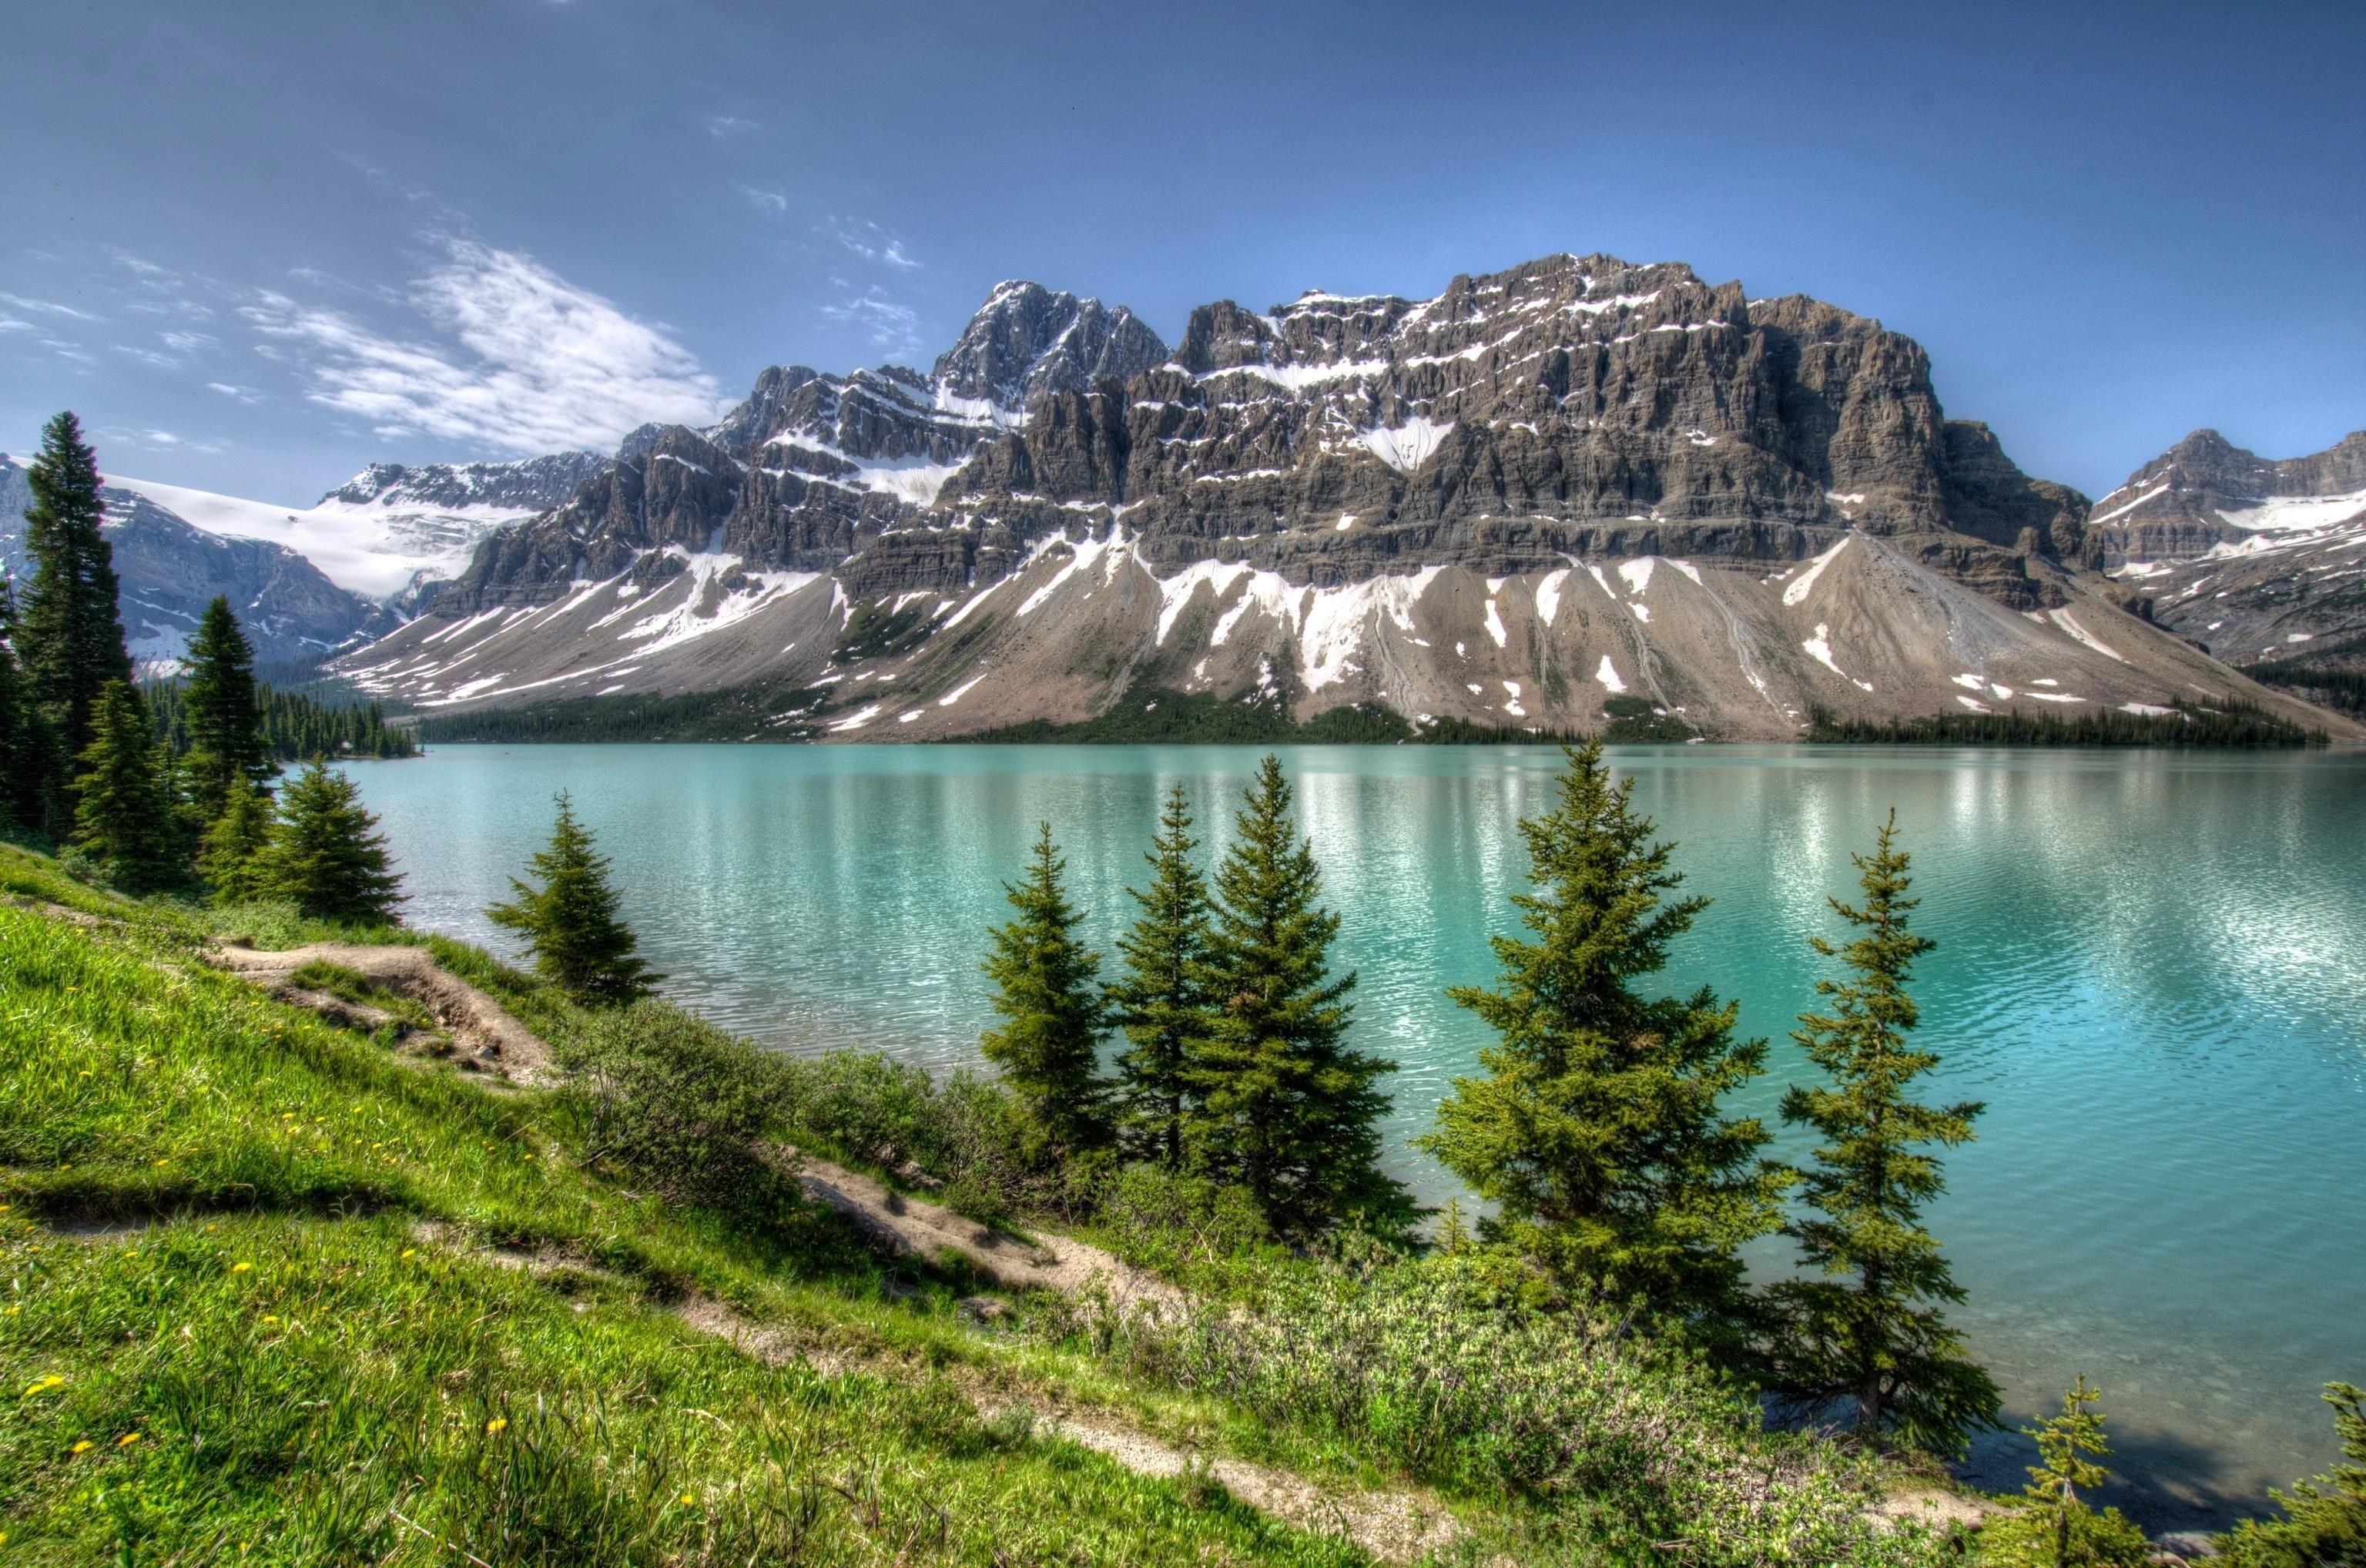 Landscape Nature Lake Mountain Hd Wallpaper Banff National Park Adventure Art Landscape